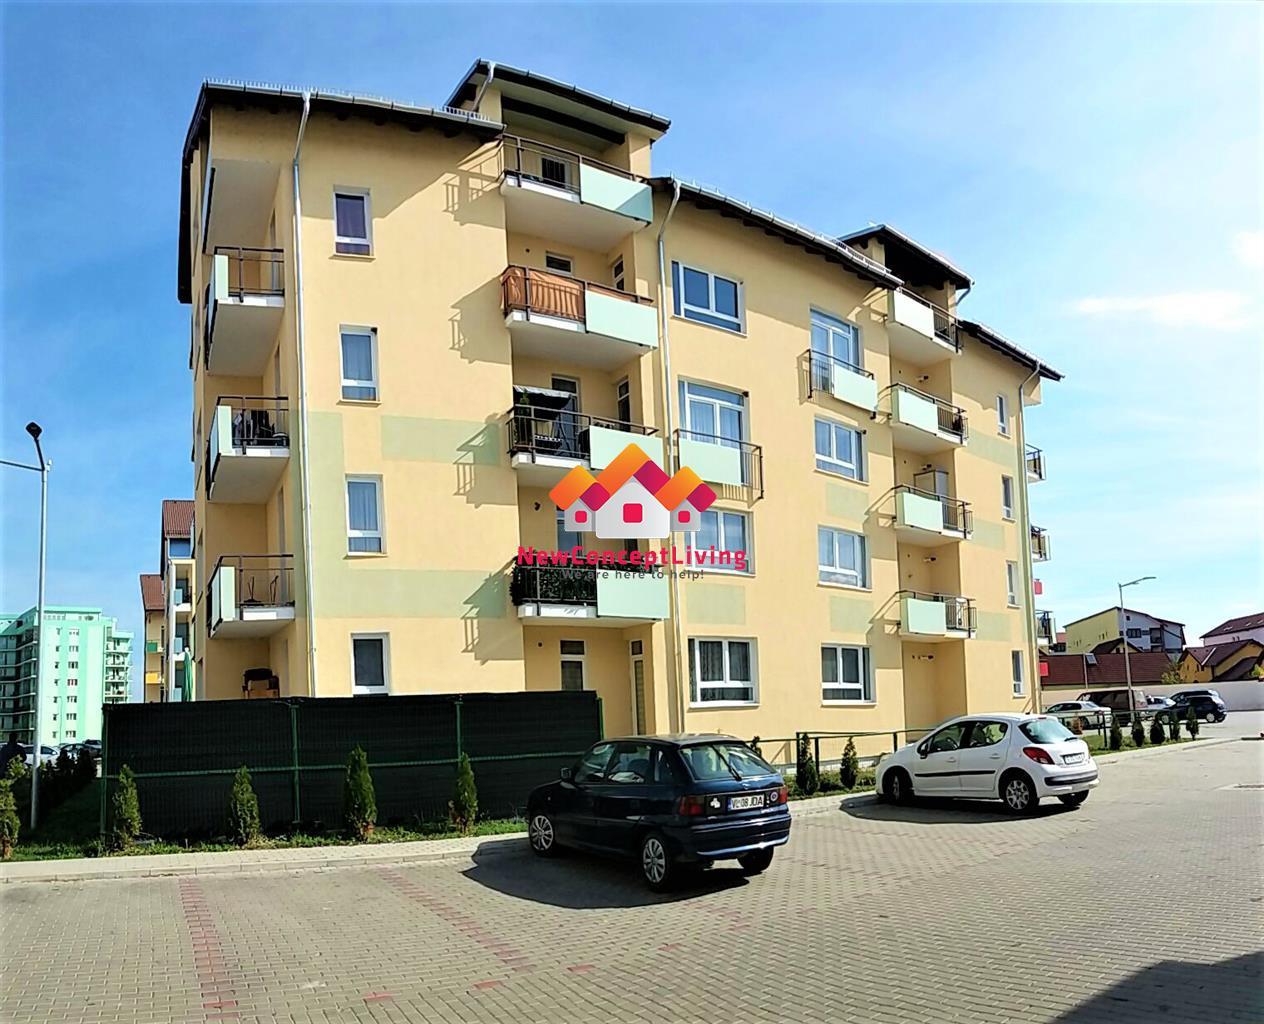 Garsoniera de vanzare in Sibiu-Alma, DECOMANDATA si INTABULATA